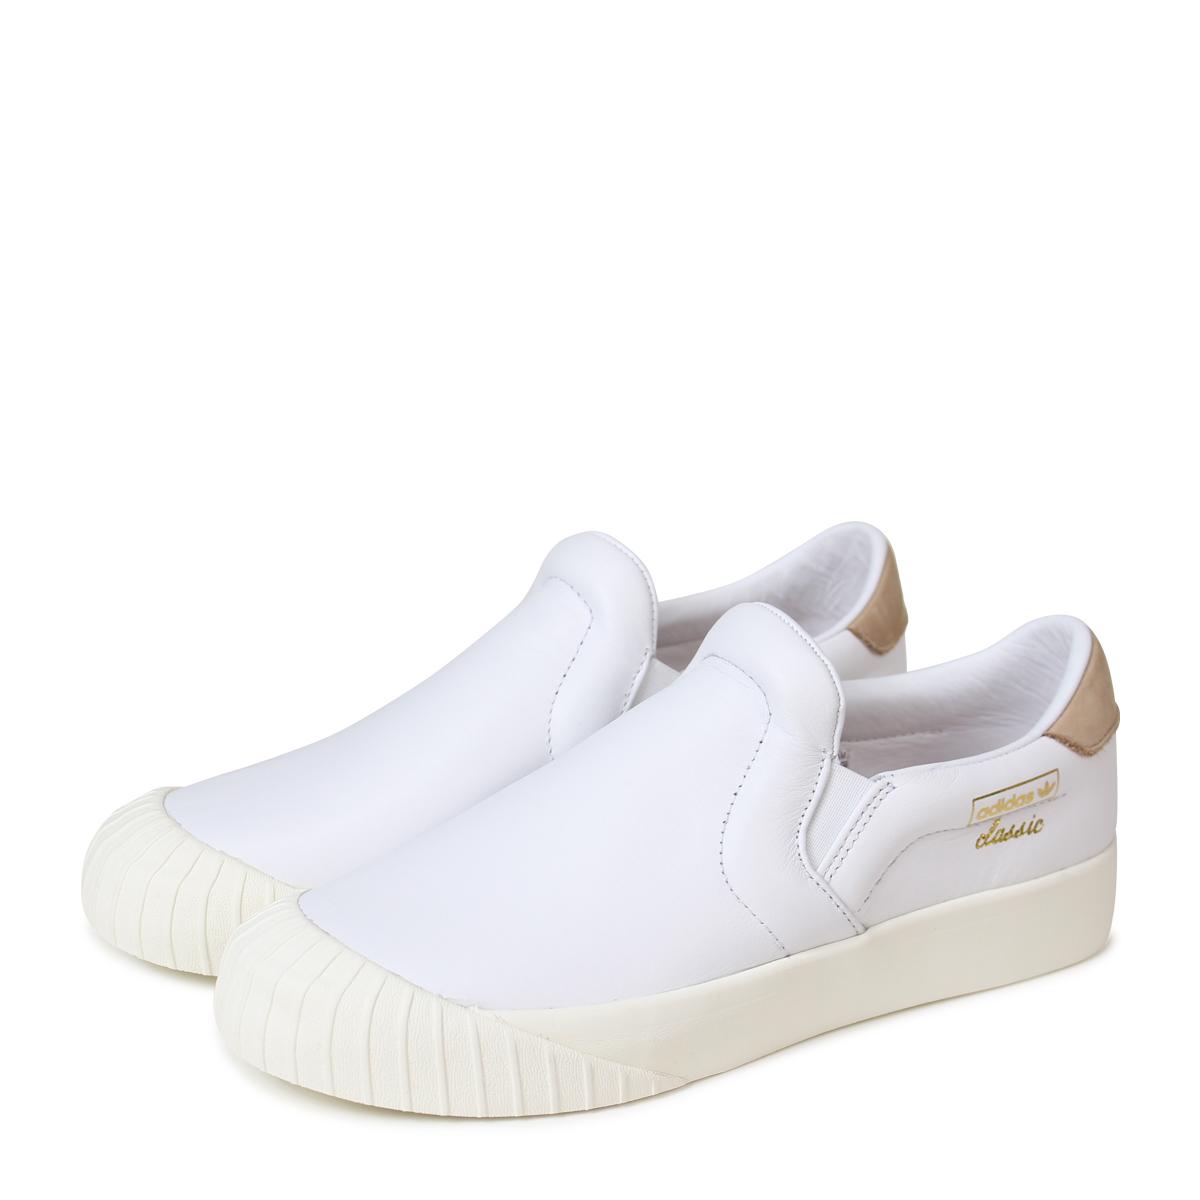 Allsports Rakuten Everyn Mercato Globale: Adidas Originali Everyn Rakuten Slipon W fe76c1